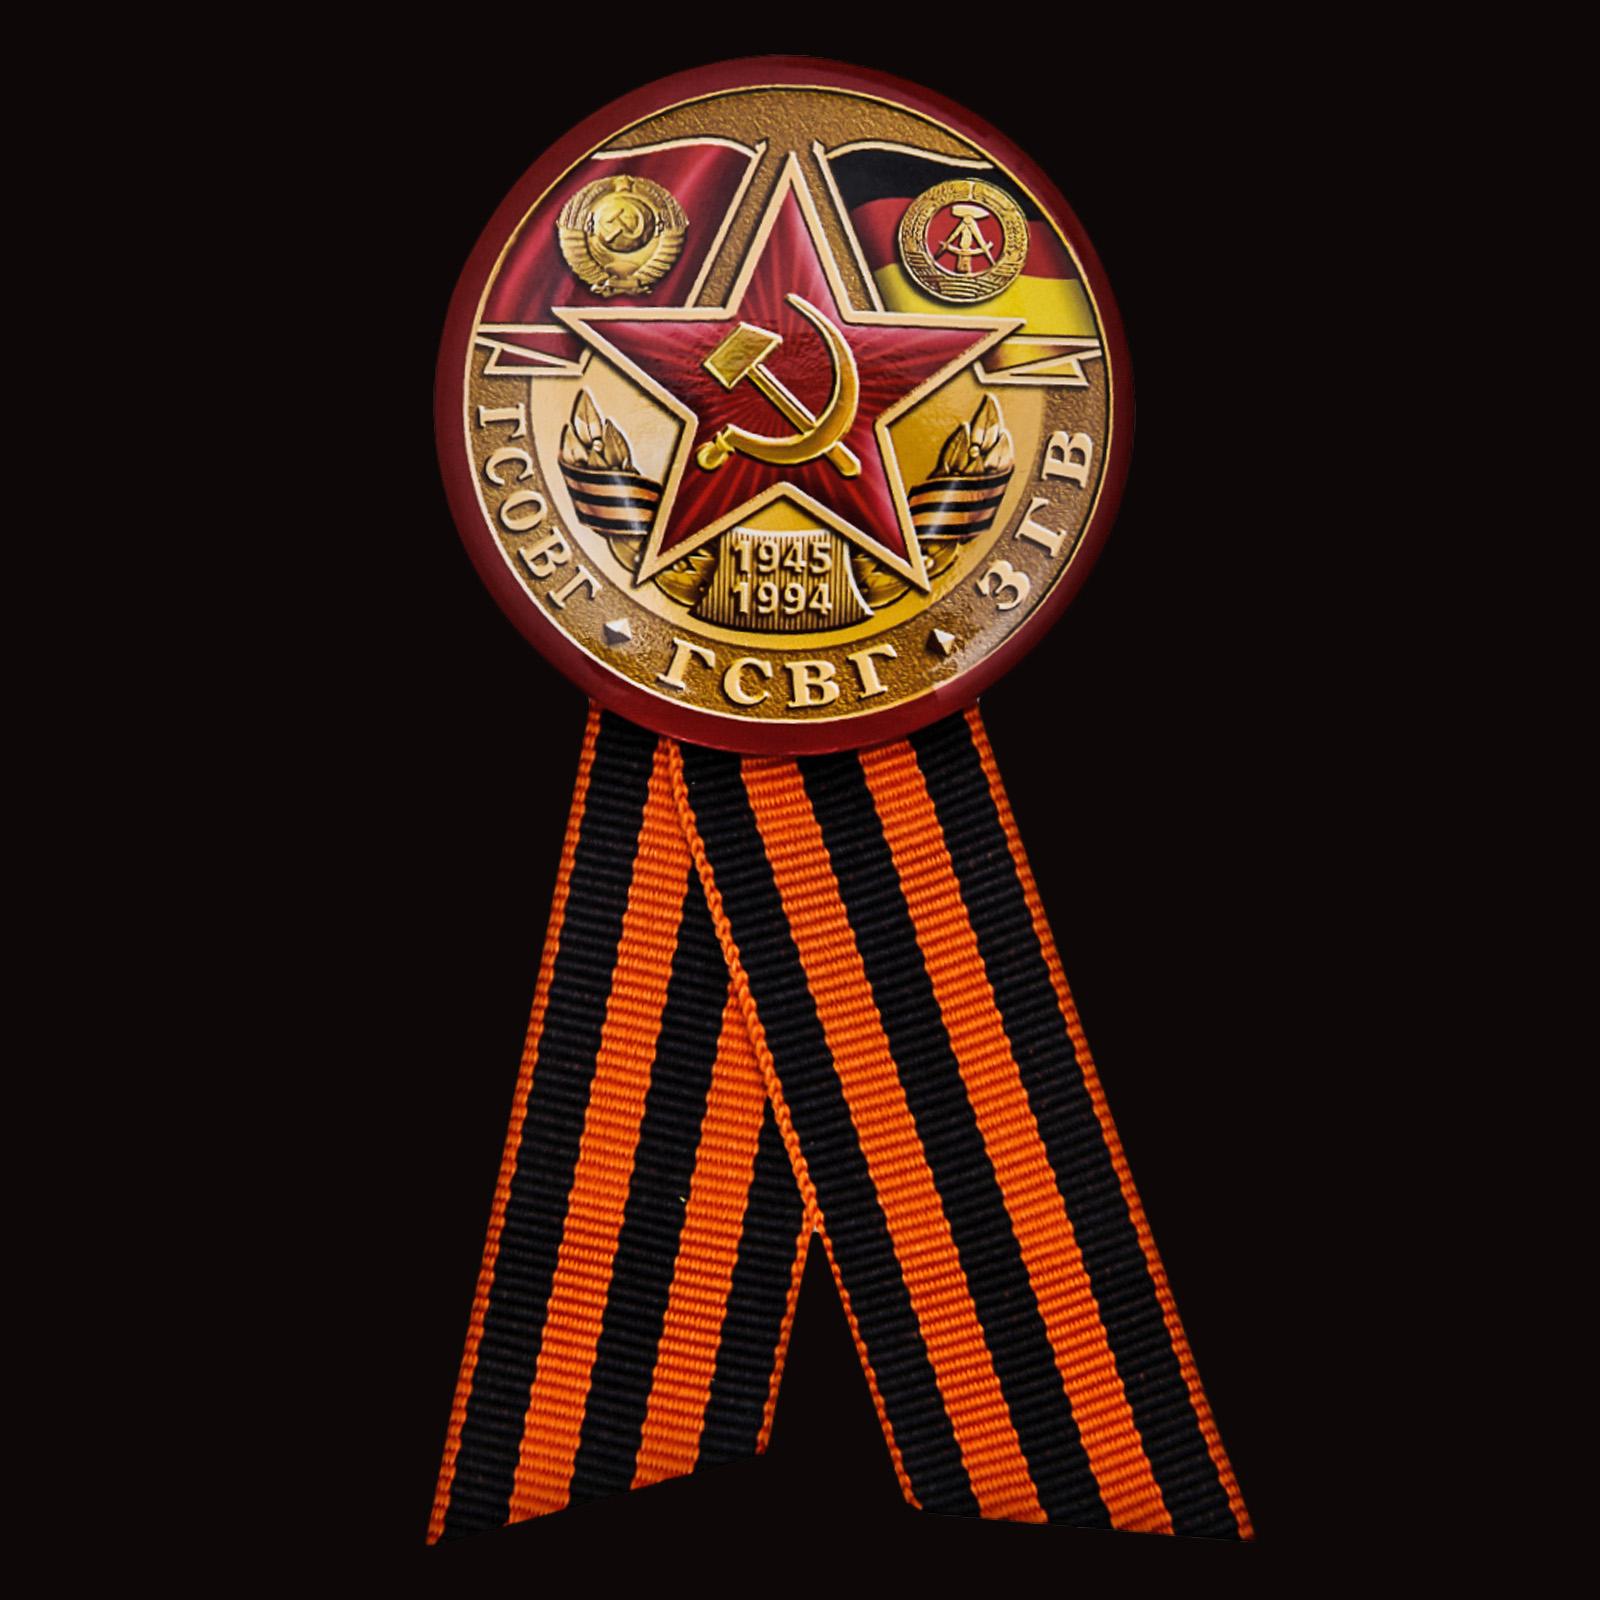 Значок «ГСОВГ-ГСВГ-ЗГВ. 1945-1994» в Военпро